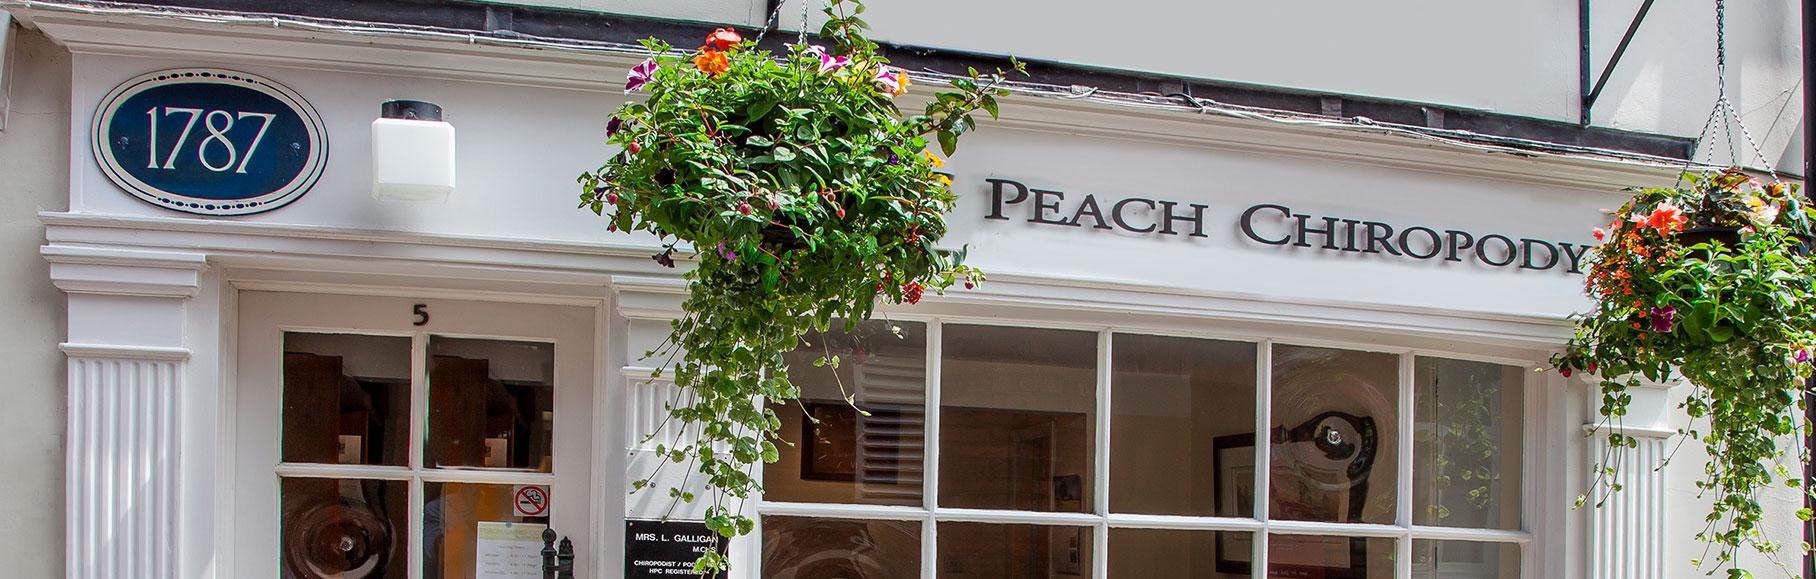 Peach Chiropody Exterior